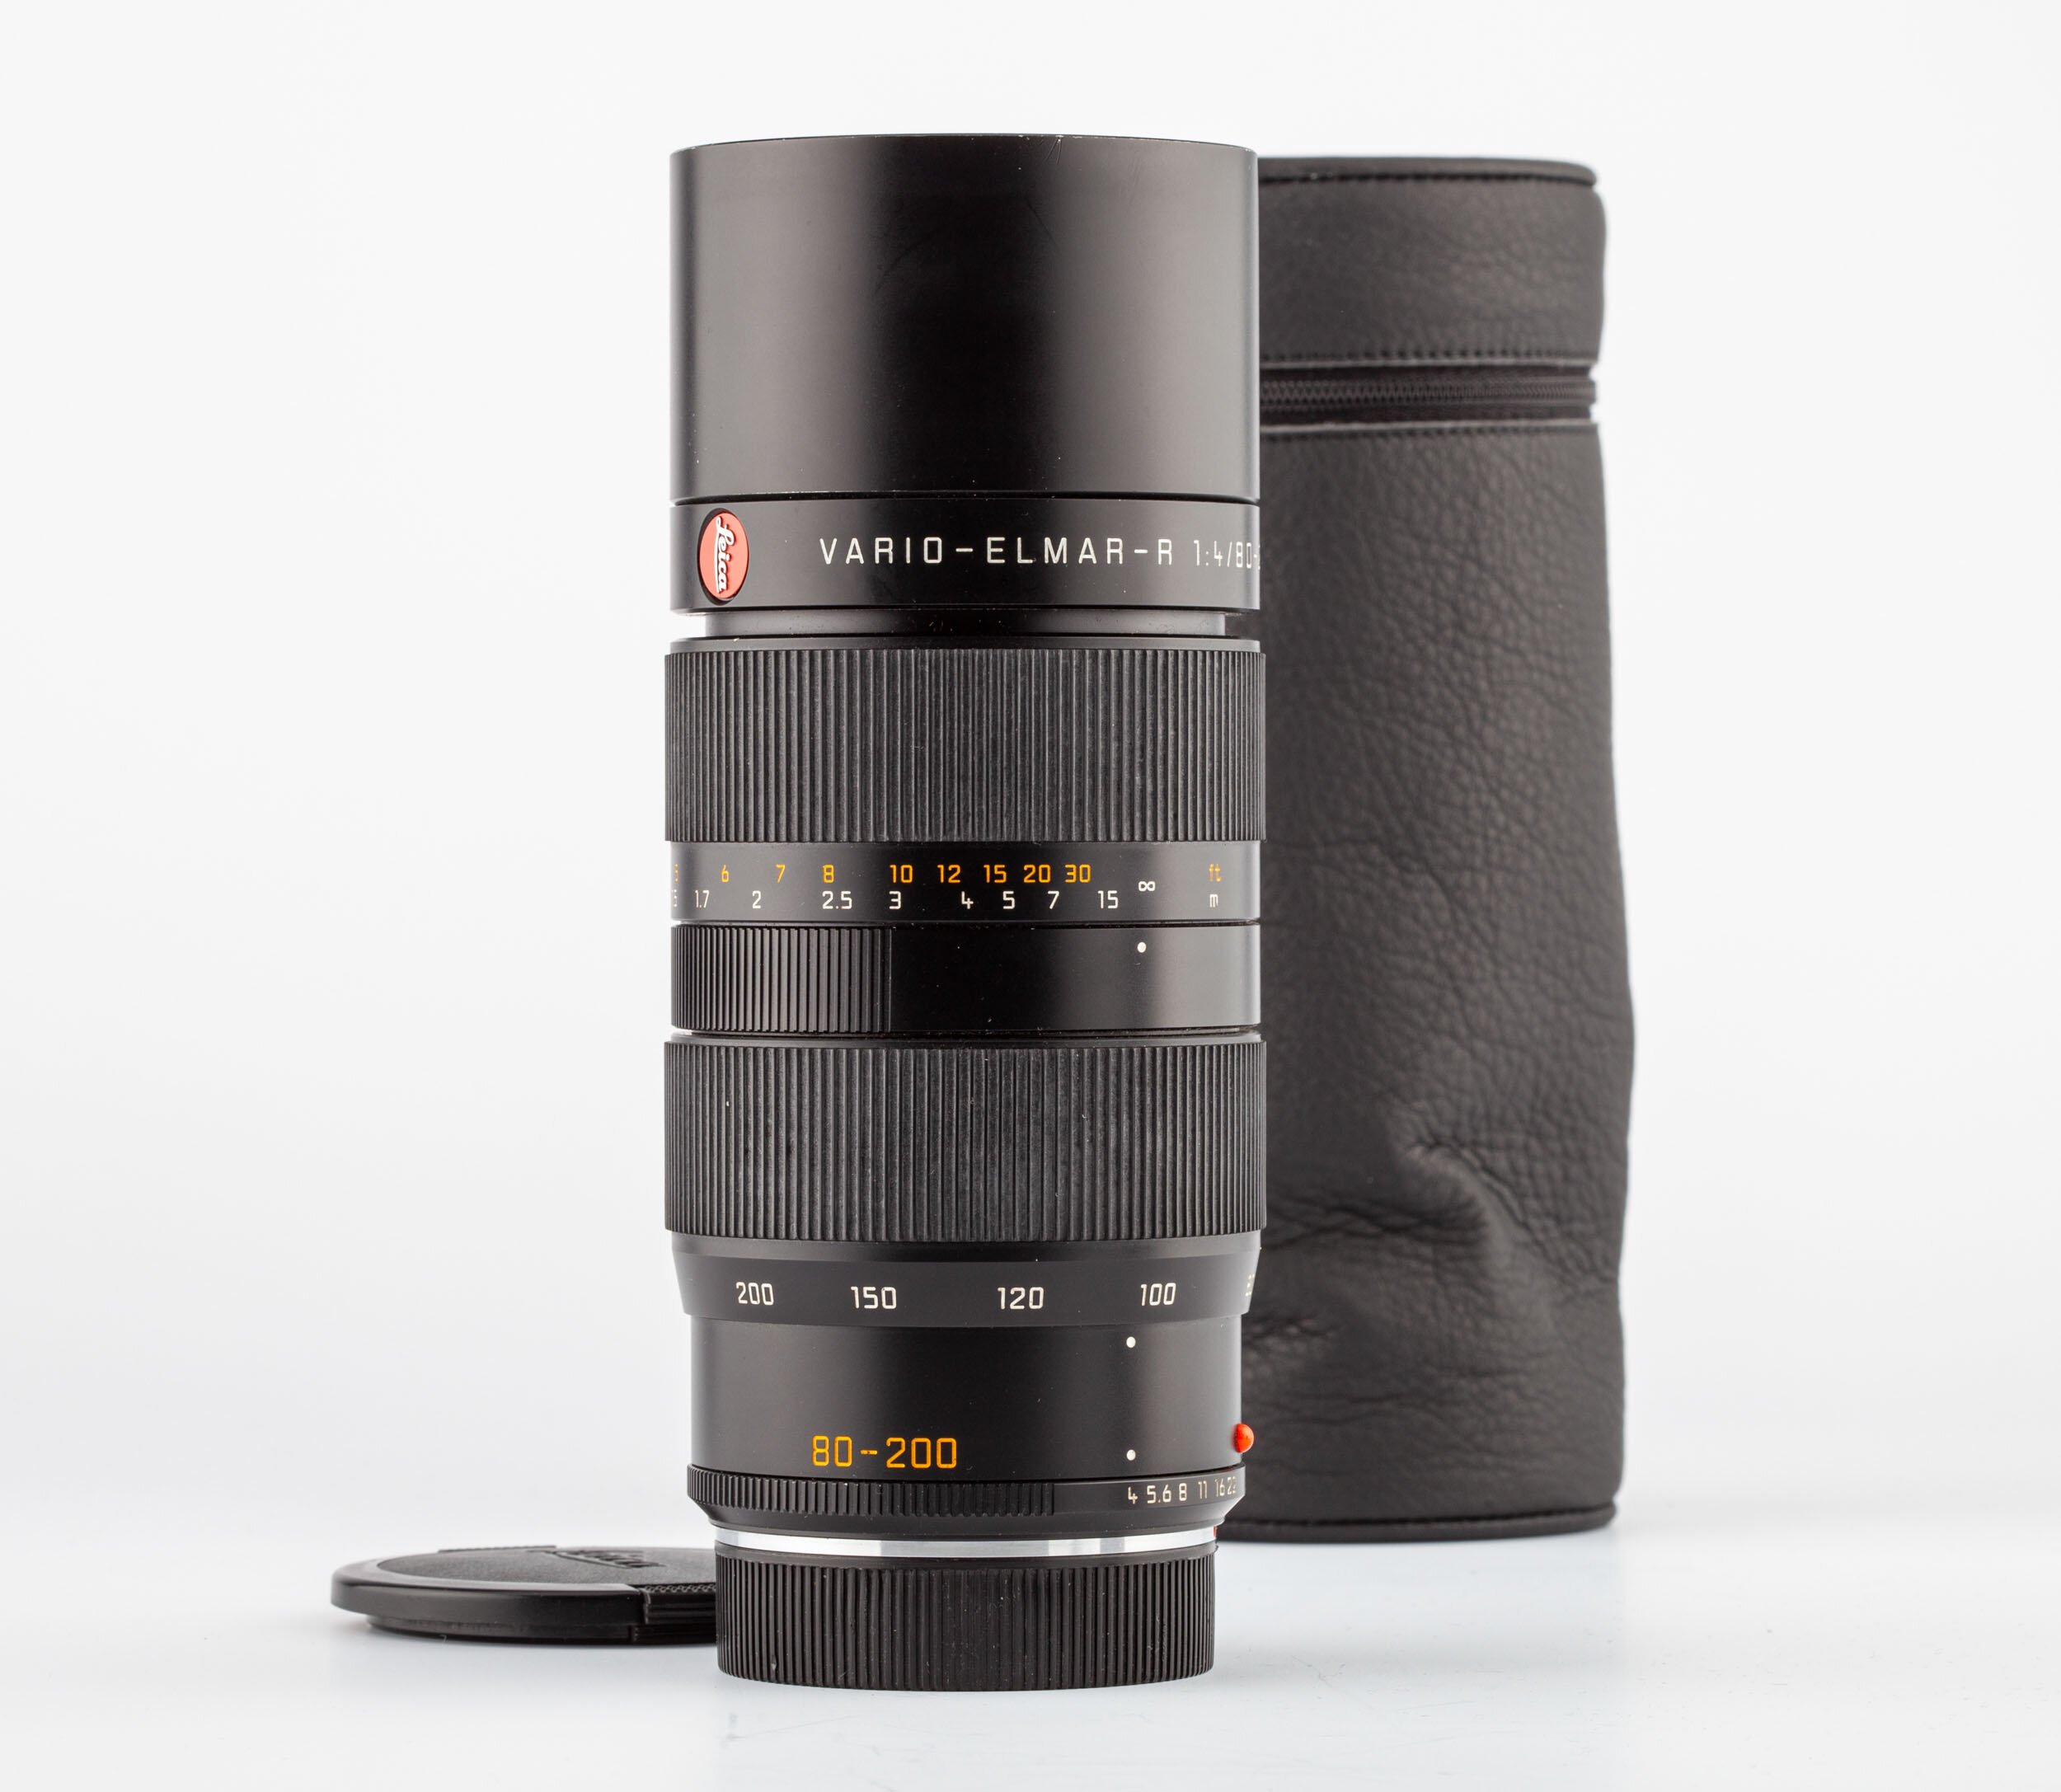 Leica Vario-Elmar-R 4/80-200 E60 ROM